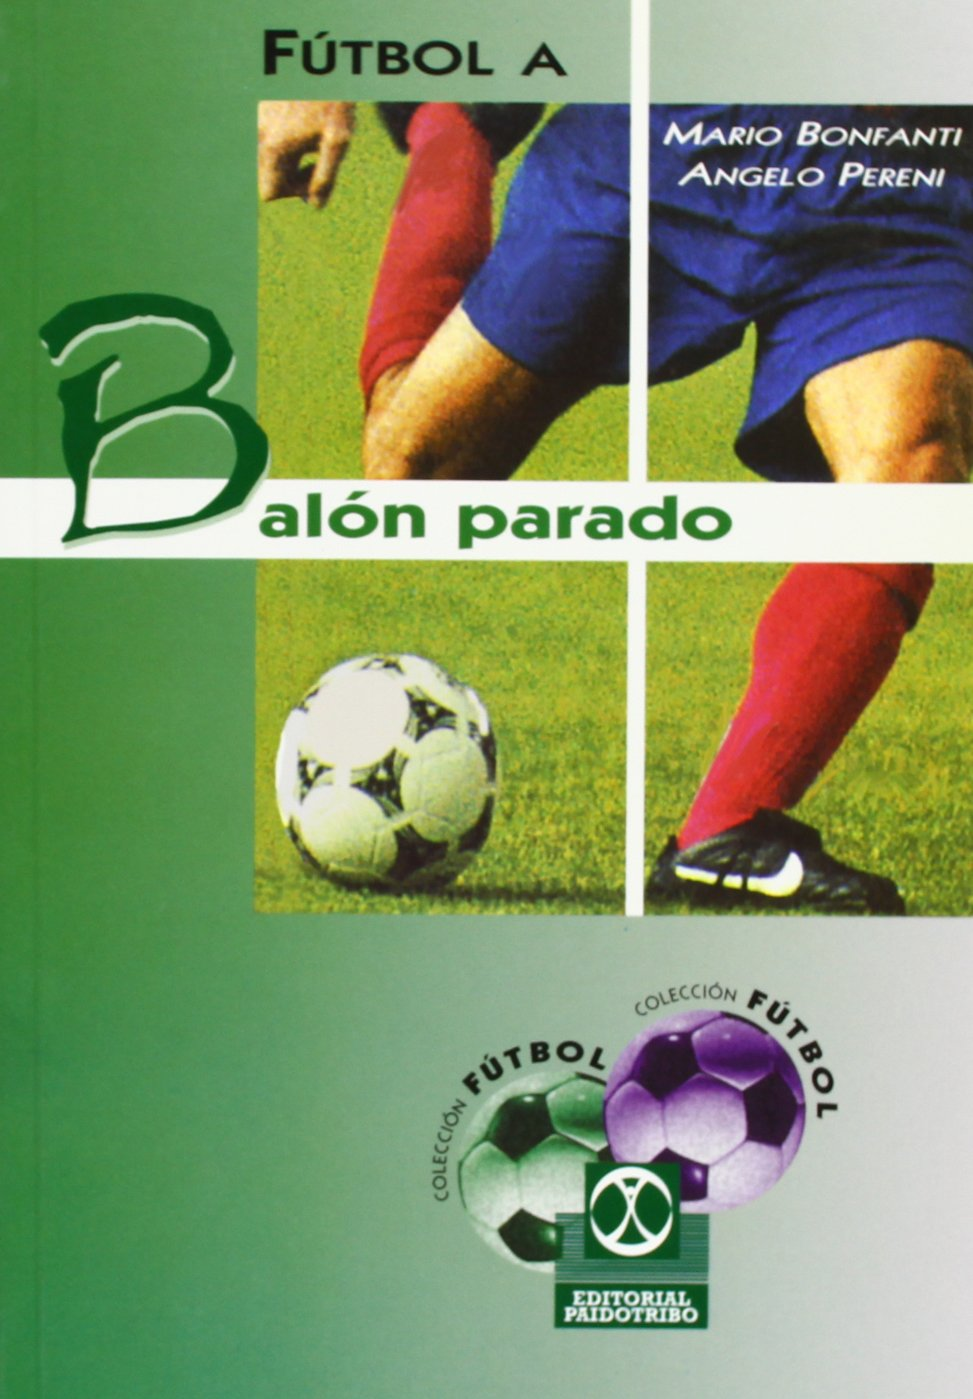 FÚTBOL A BALÓN PARADO (Deportes): Amazon.es: Bonfanti, Mario ...